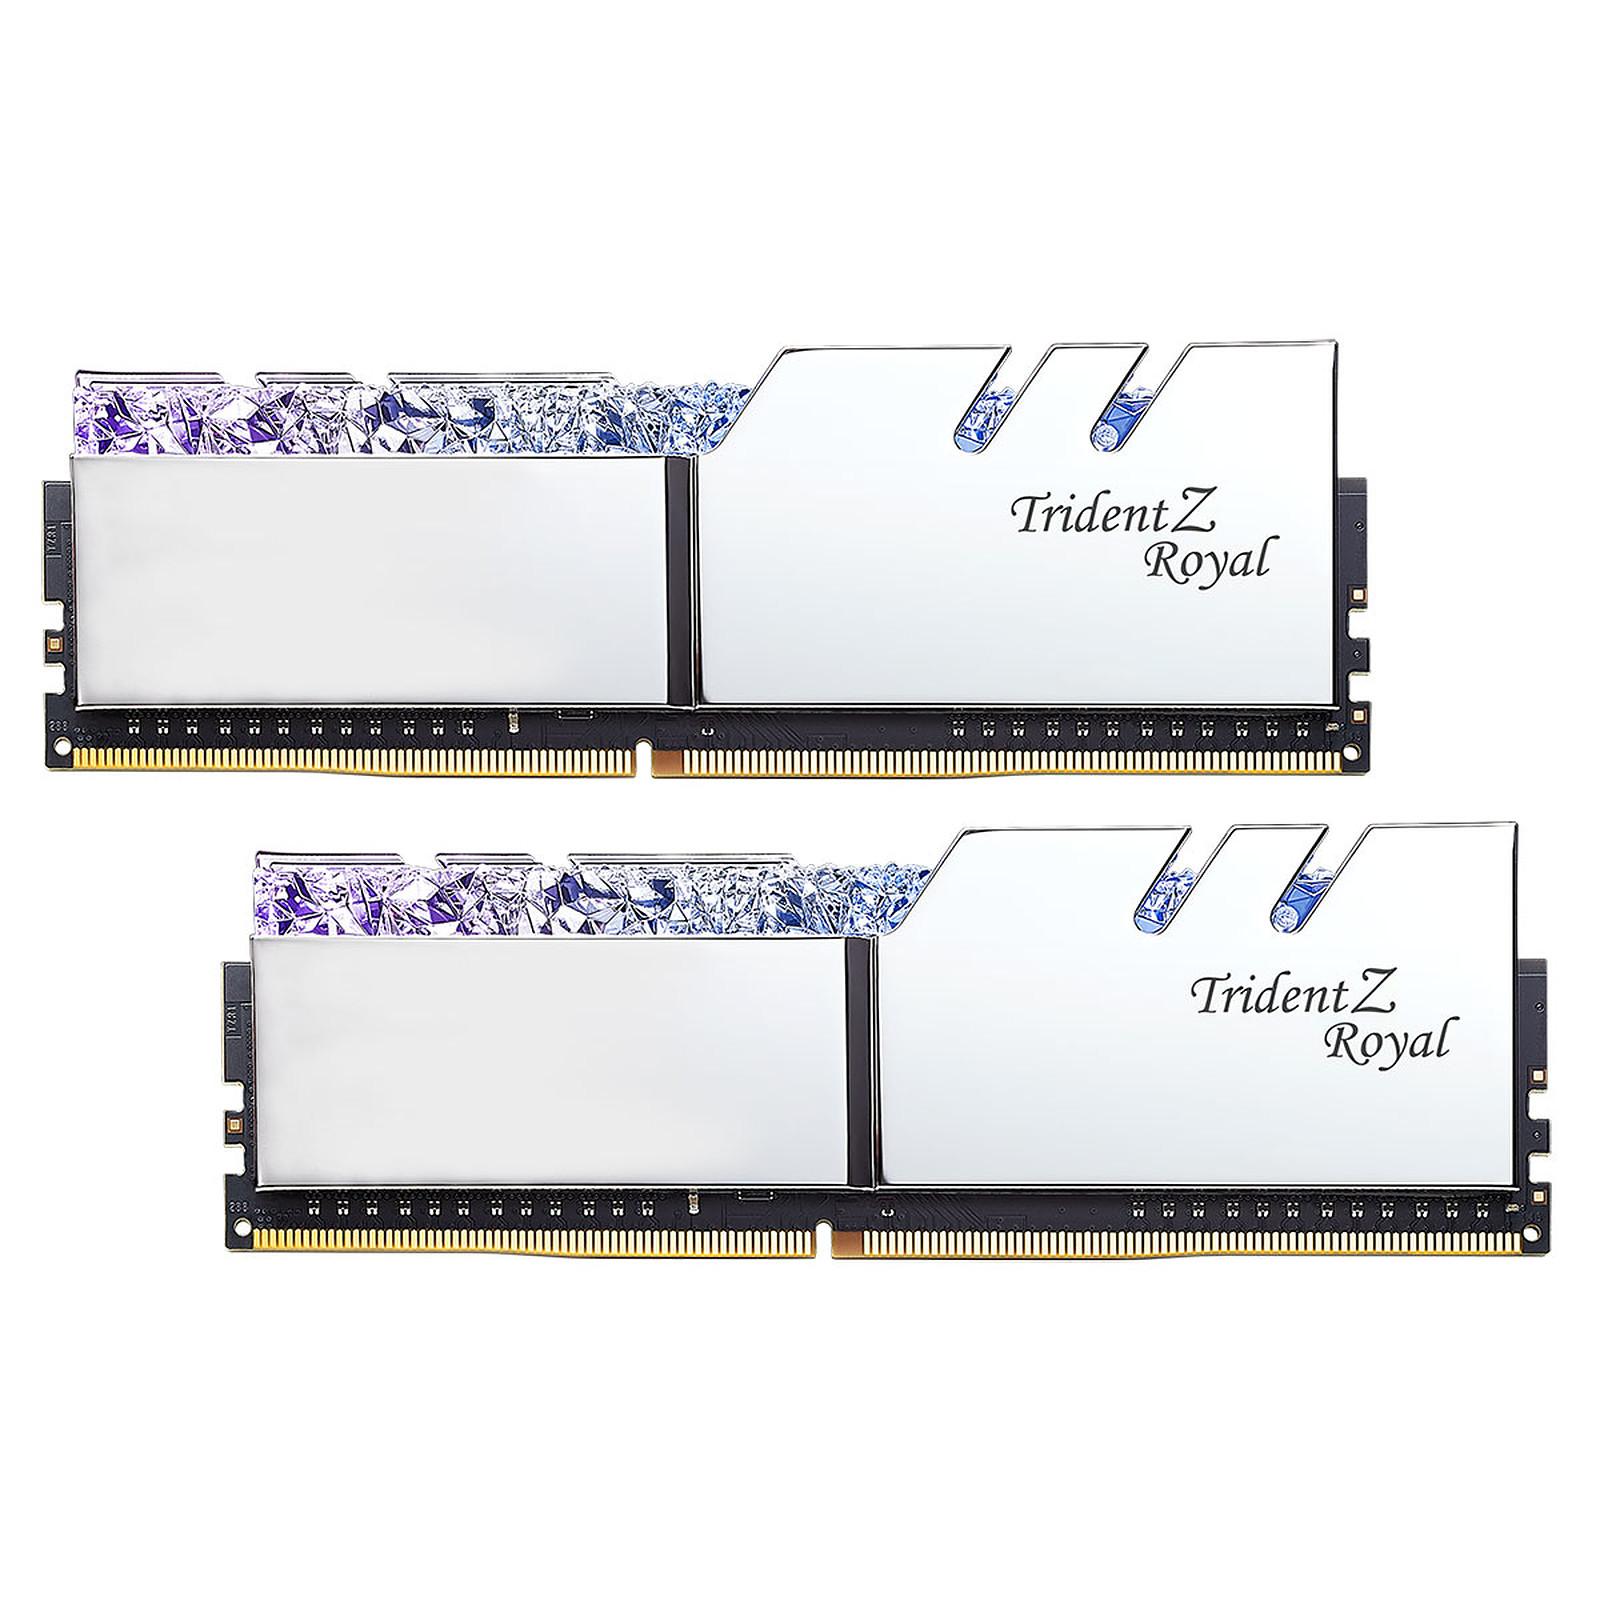 G.Skill Trident Z Royal 16GB (2 x 8GB) DDR4 4800 MHz CL18 - Plata